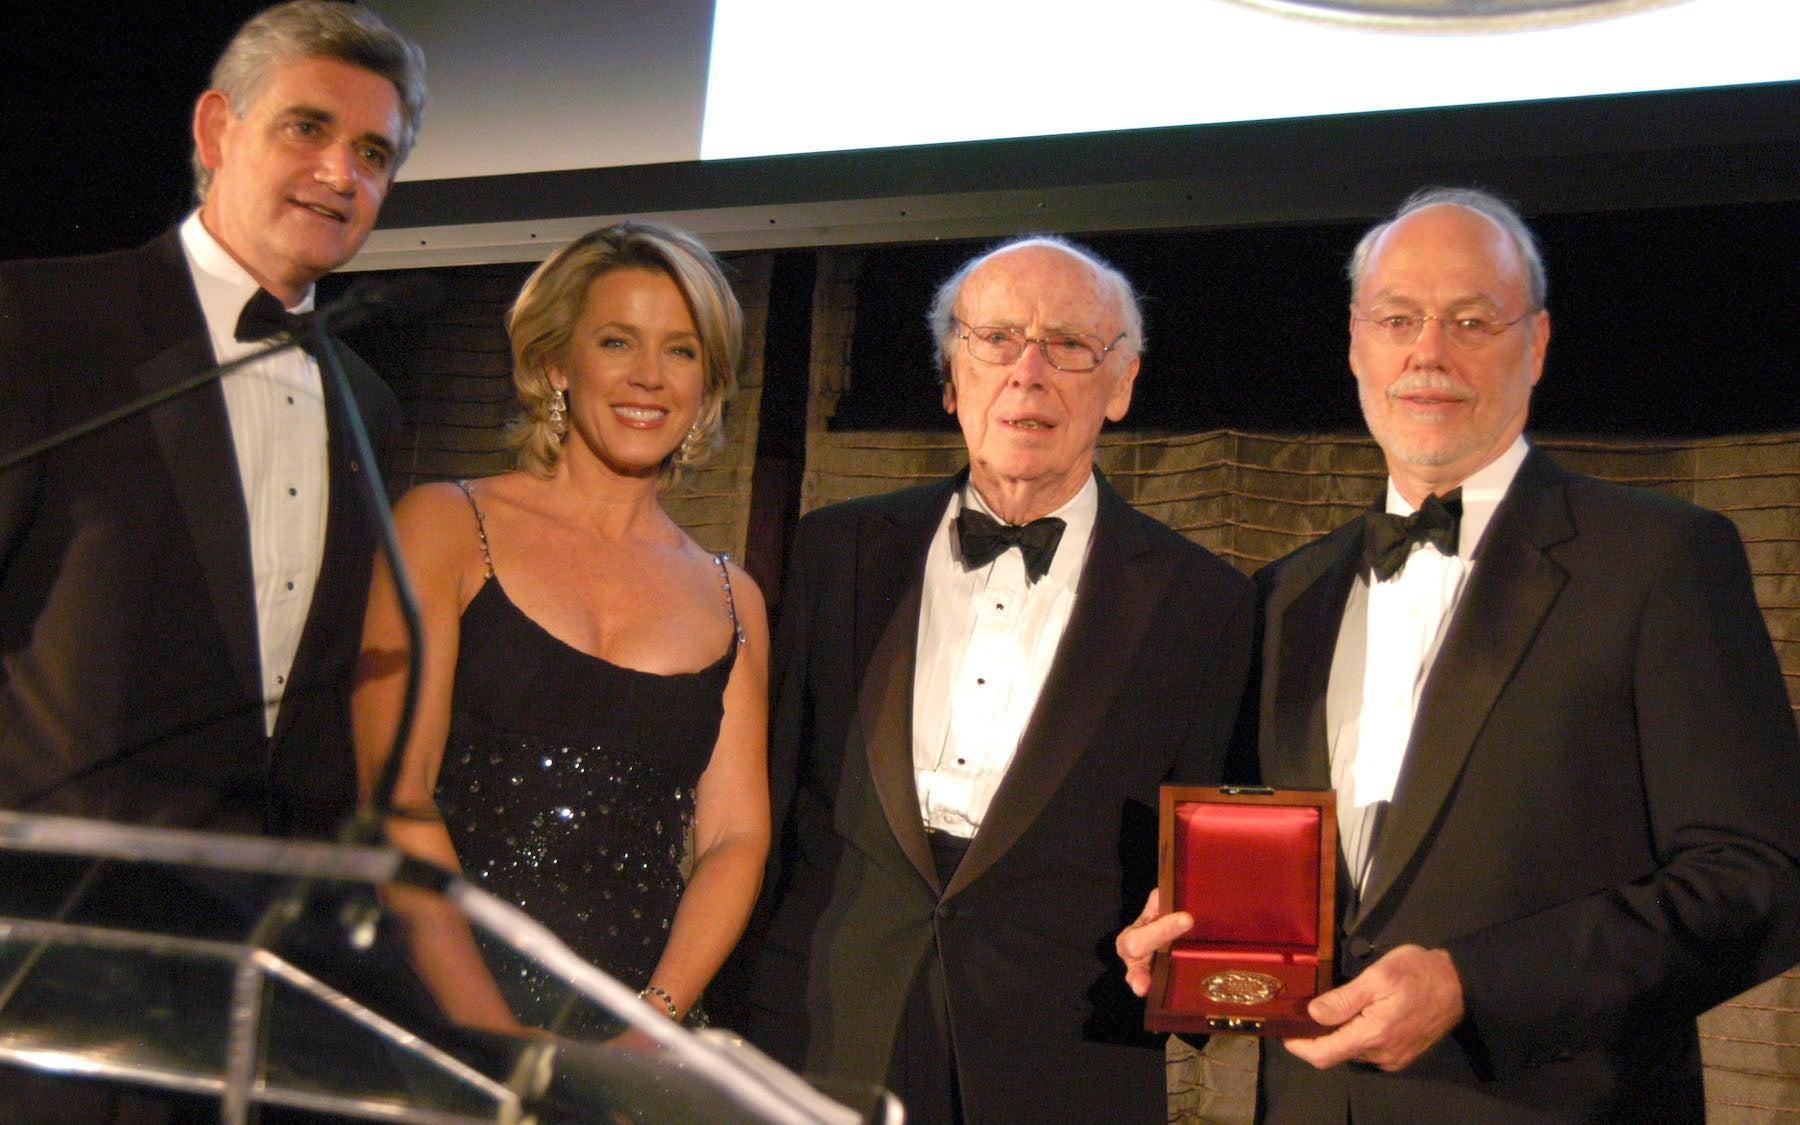 Bruce Stillman, Evening Presenter Inside Edition's Deborah Norville, Jim Watson, Honoree Dr. Phillip A. Sharp